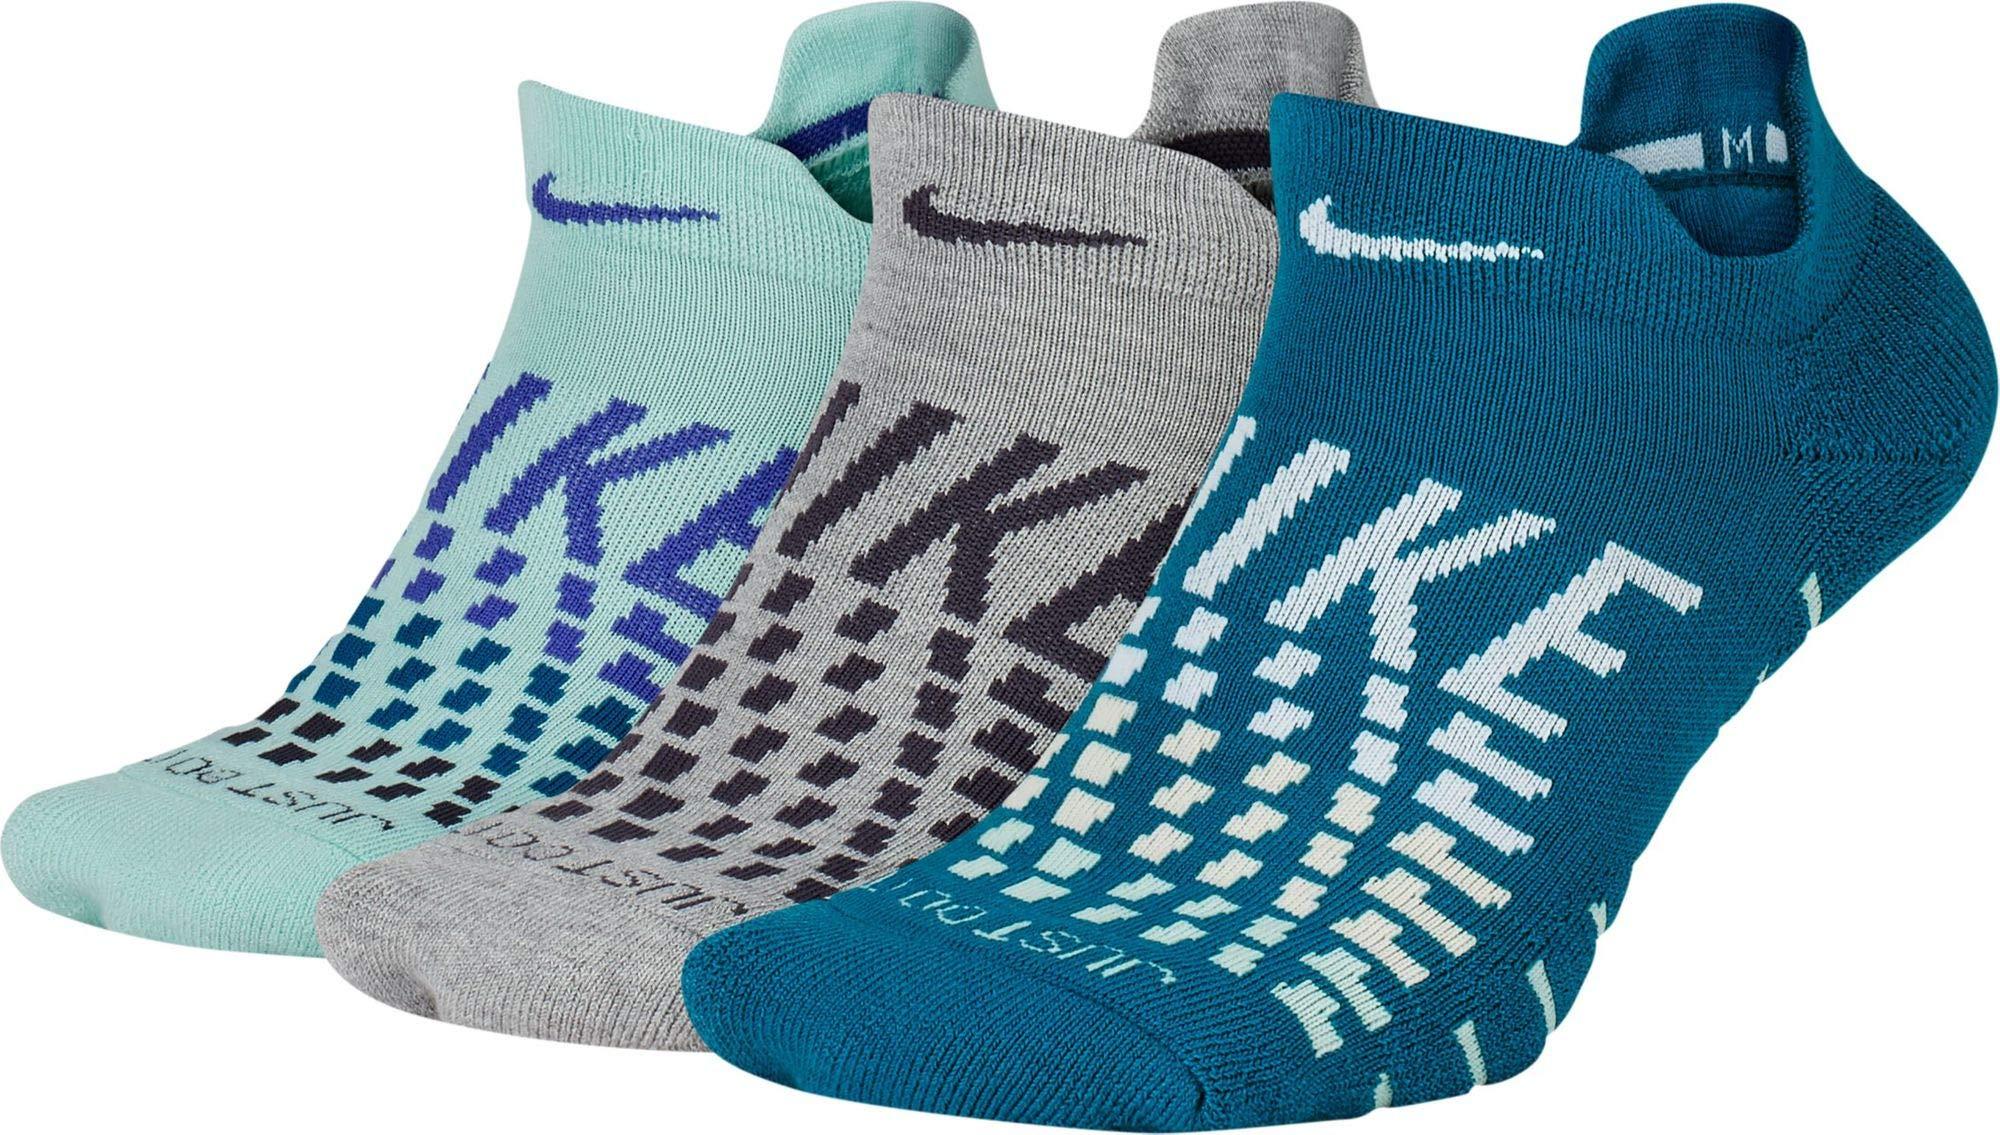 Nike Women`s Dry Cushion Low Training Socks (3 Pair) (Medium, Multi-Color(SX7067-914)/White) by Nike